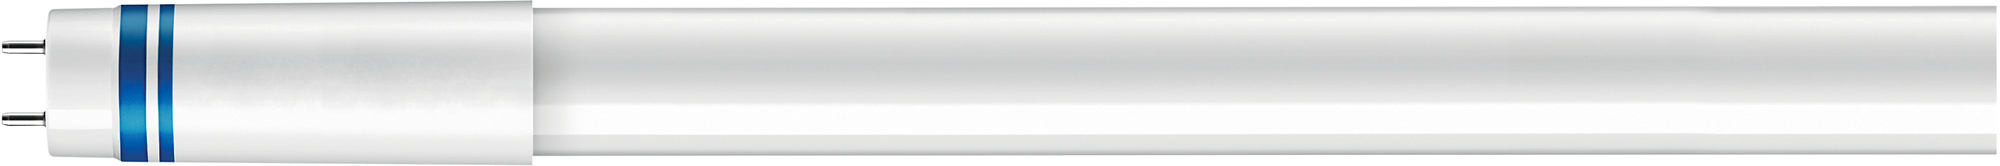 Philips MASTER LEDtube Value HF 1500mm 25W840 C ROT